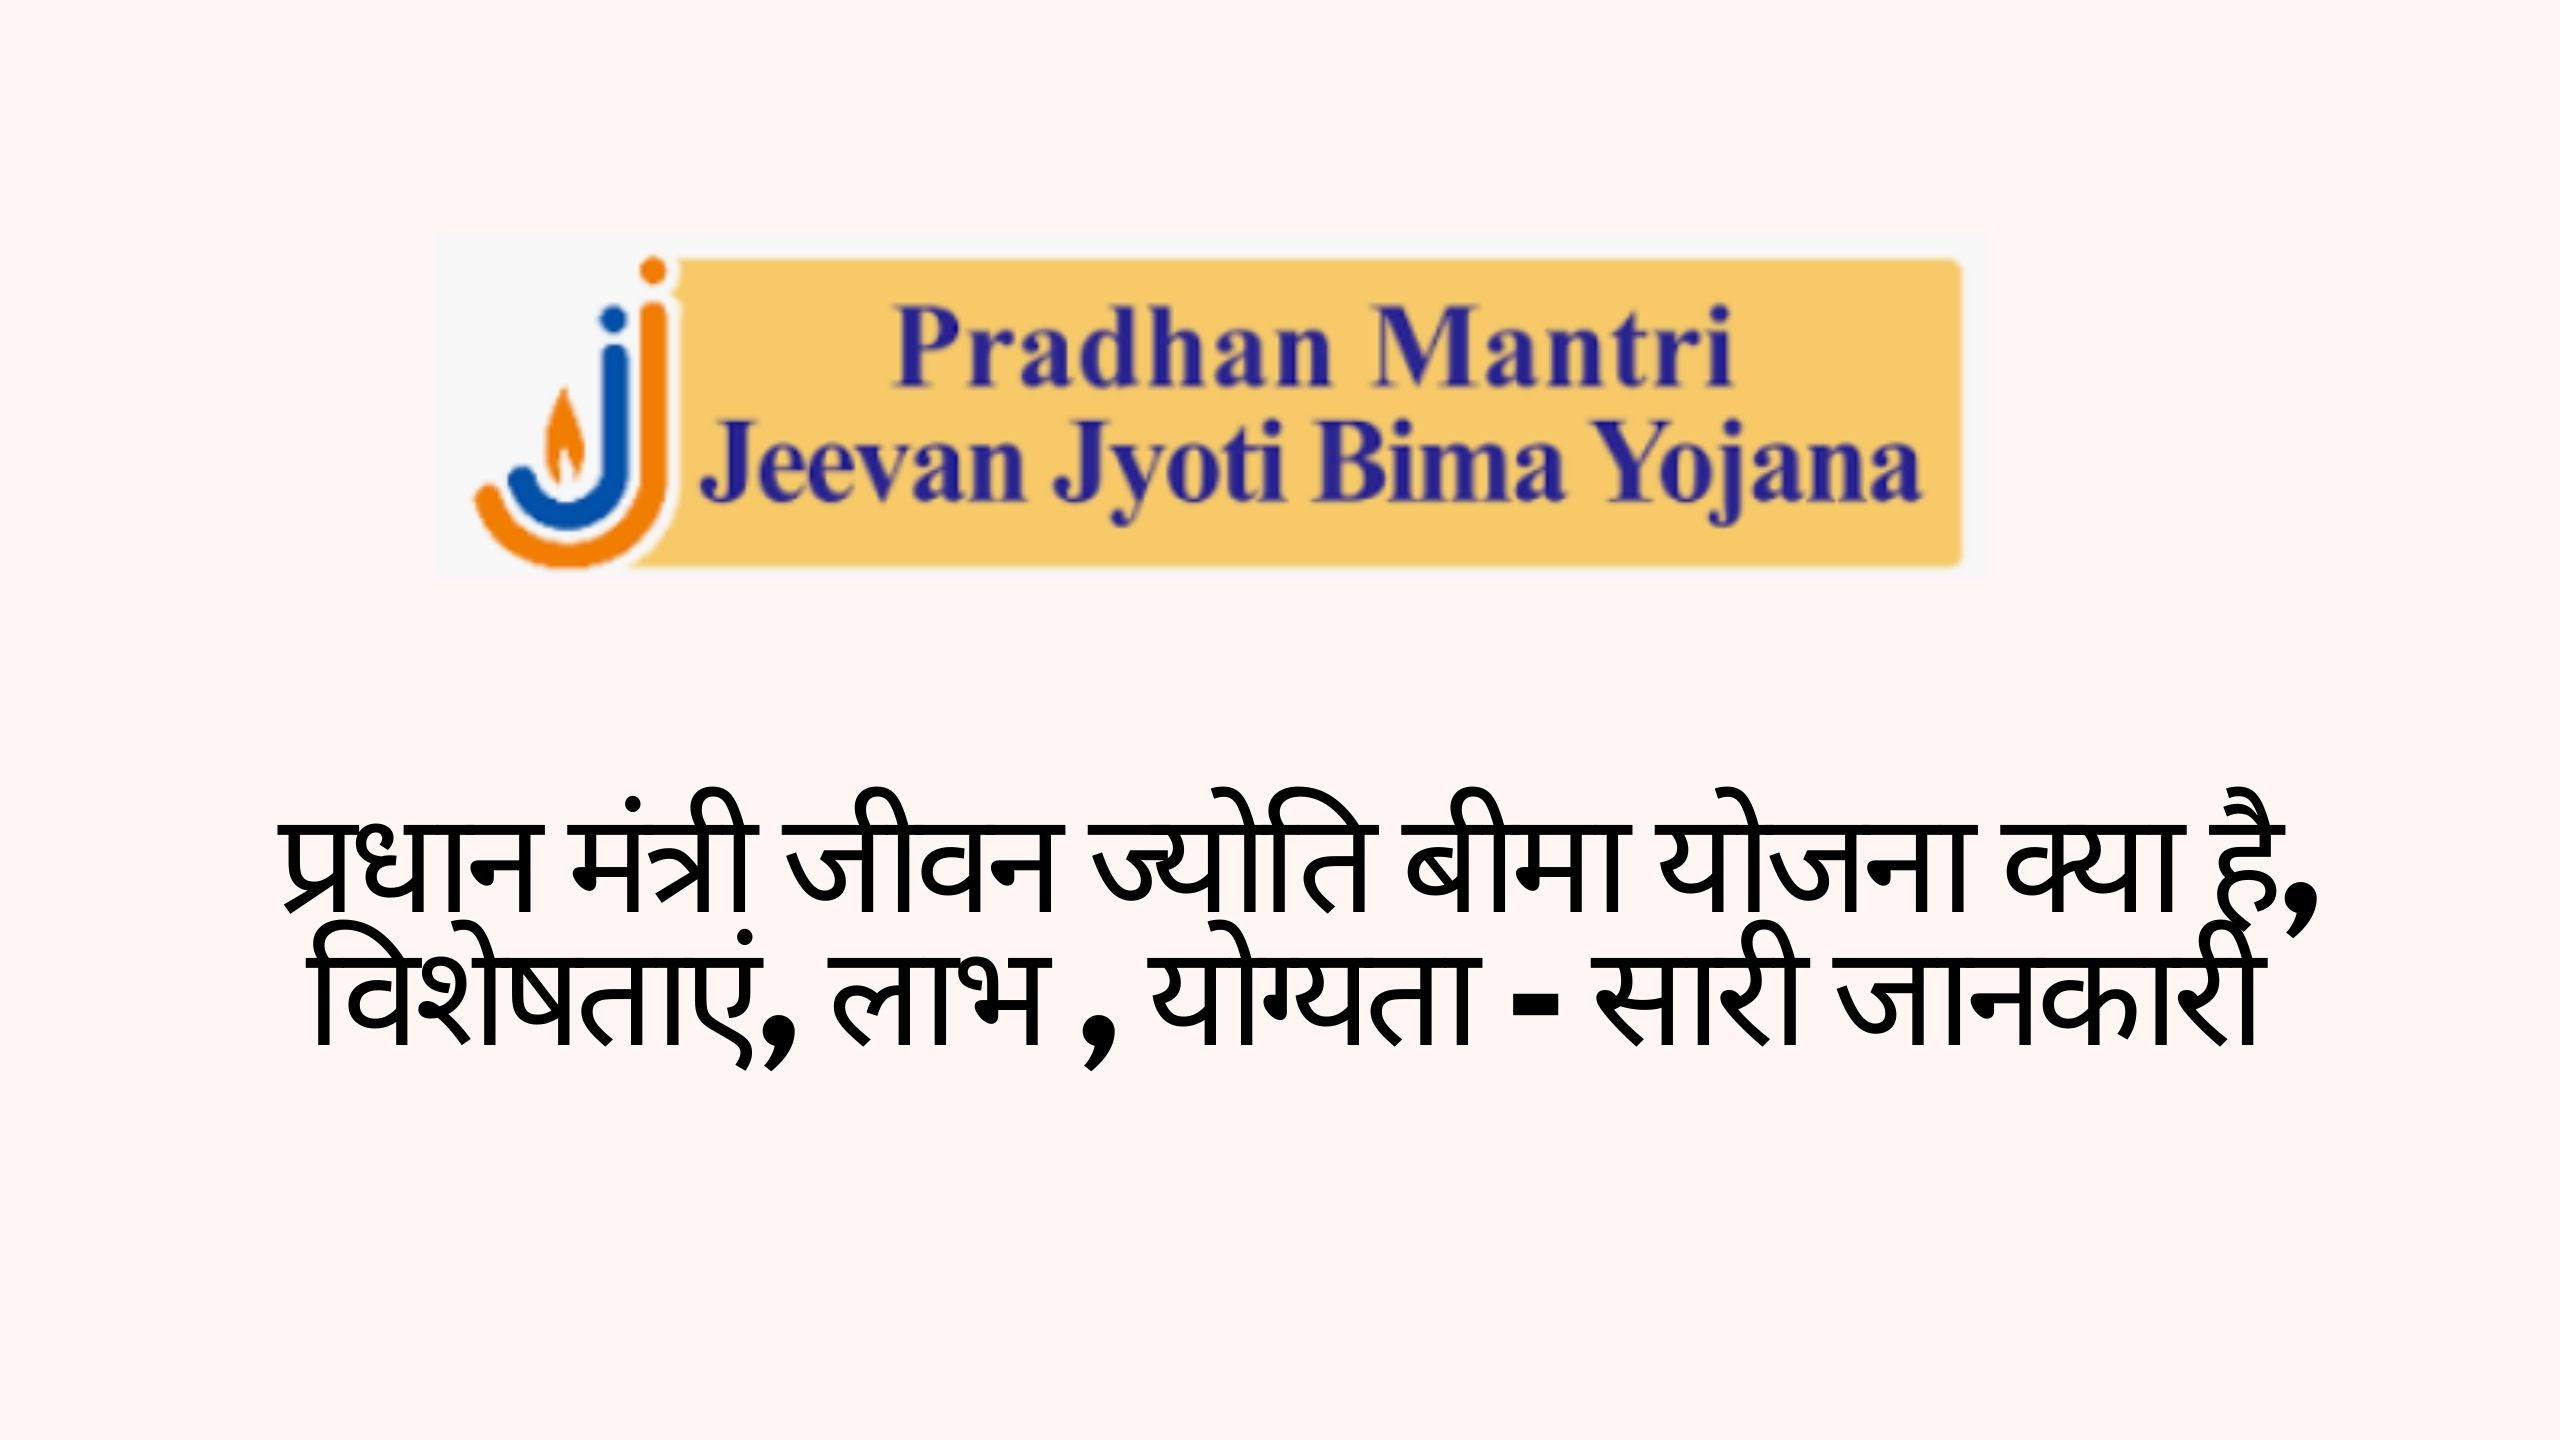 Prime Minister Jeevan Jyoti Bima Yojana